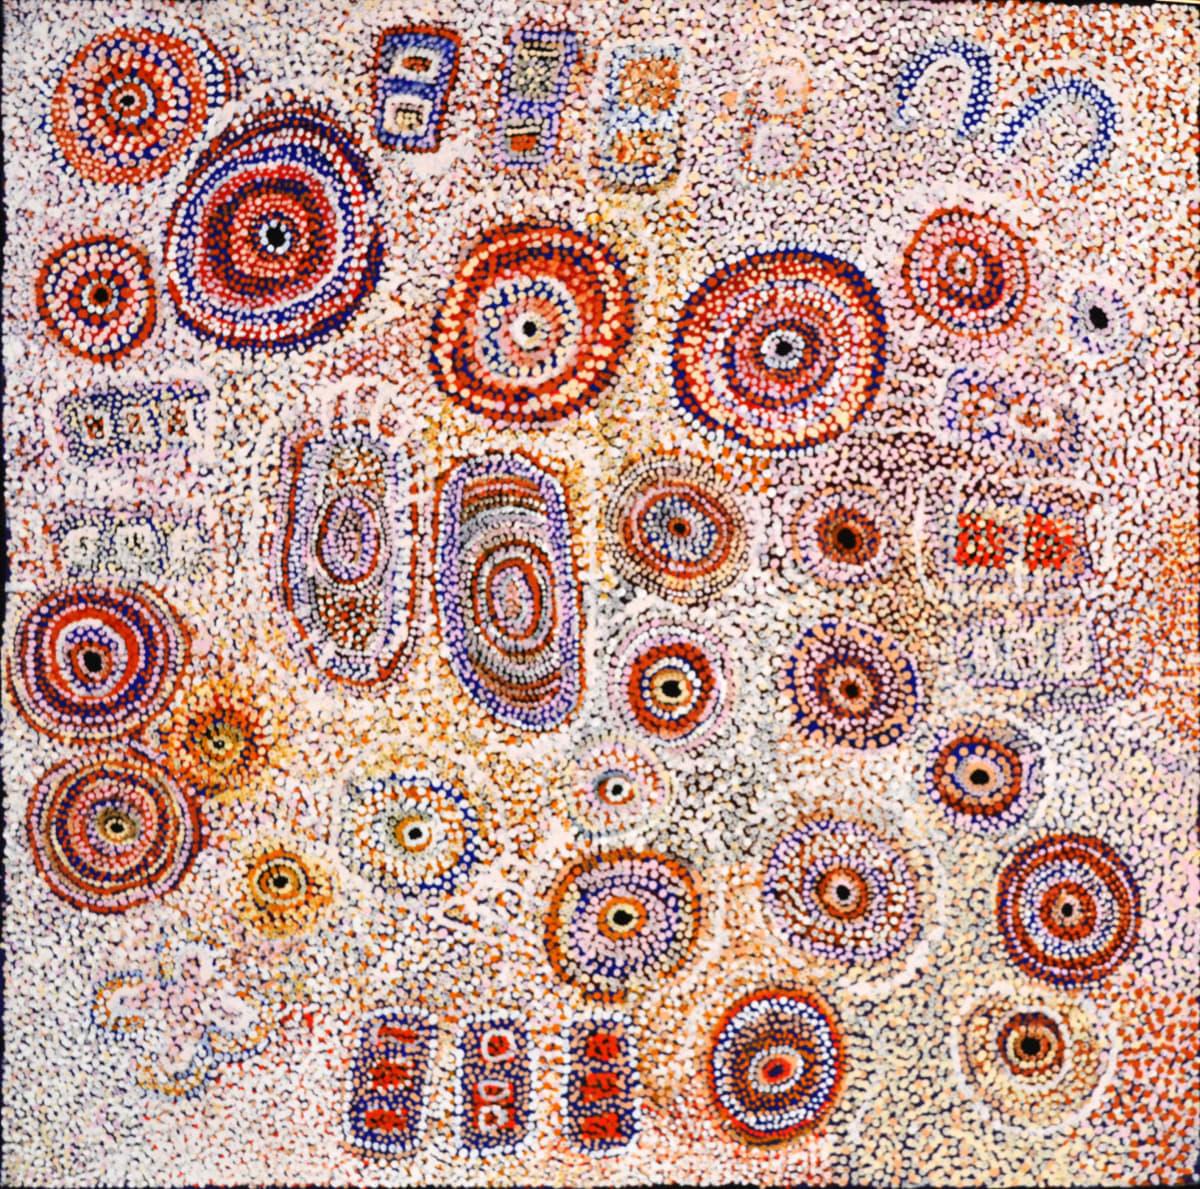 Tuppy Ngintja Goodwin Antara acrylic on linen 122 x 122 cm